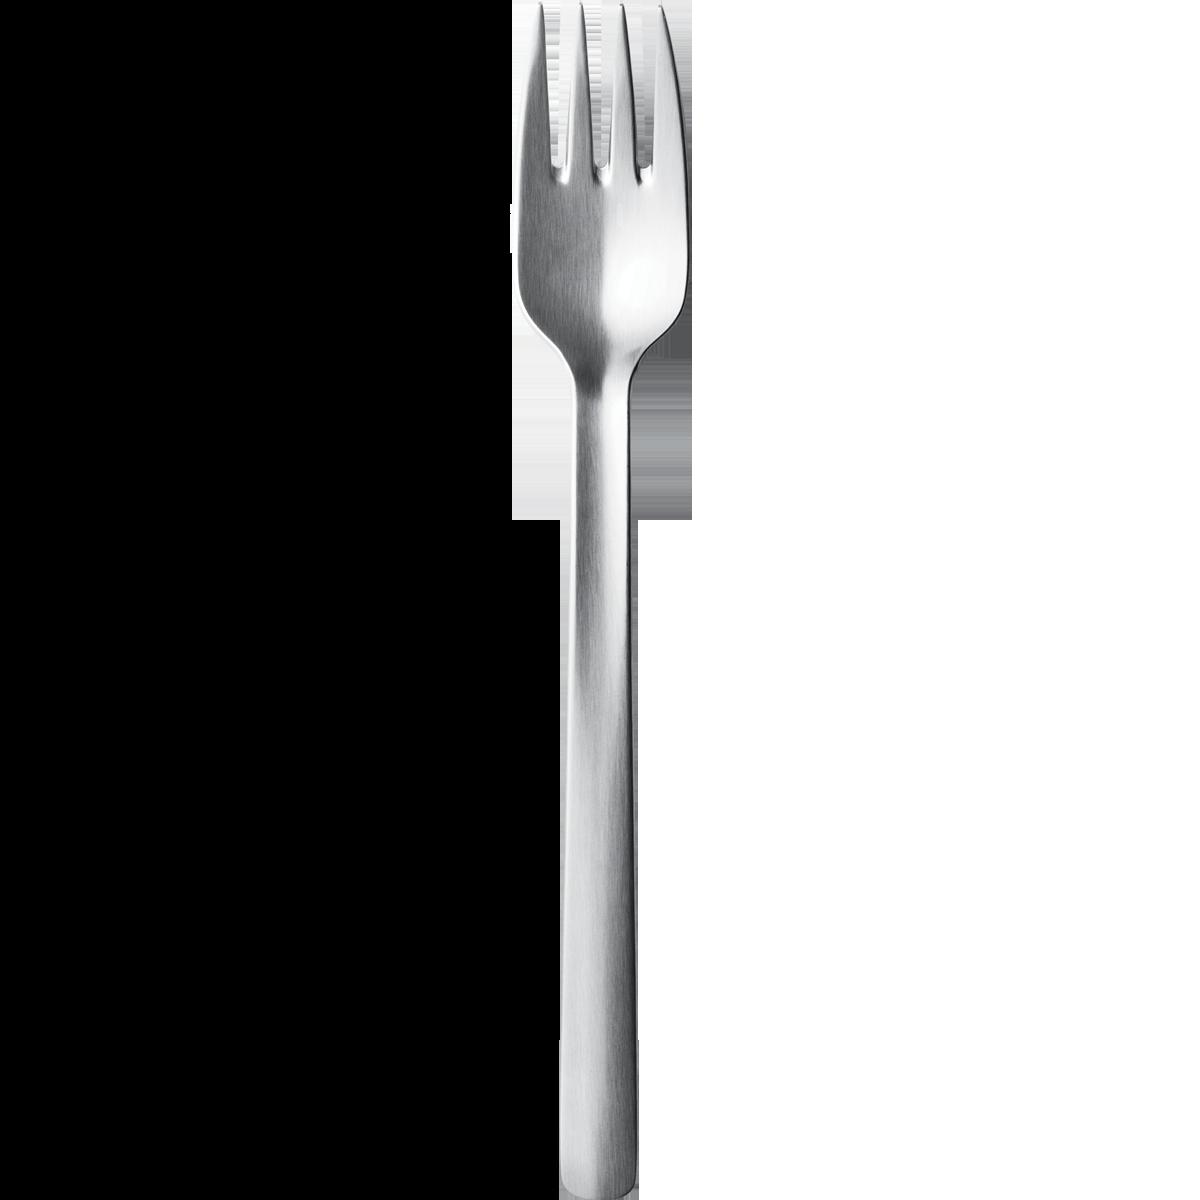 Forks PNG Images, Free Fork Picture Download - Fork HD PNG